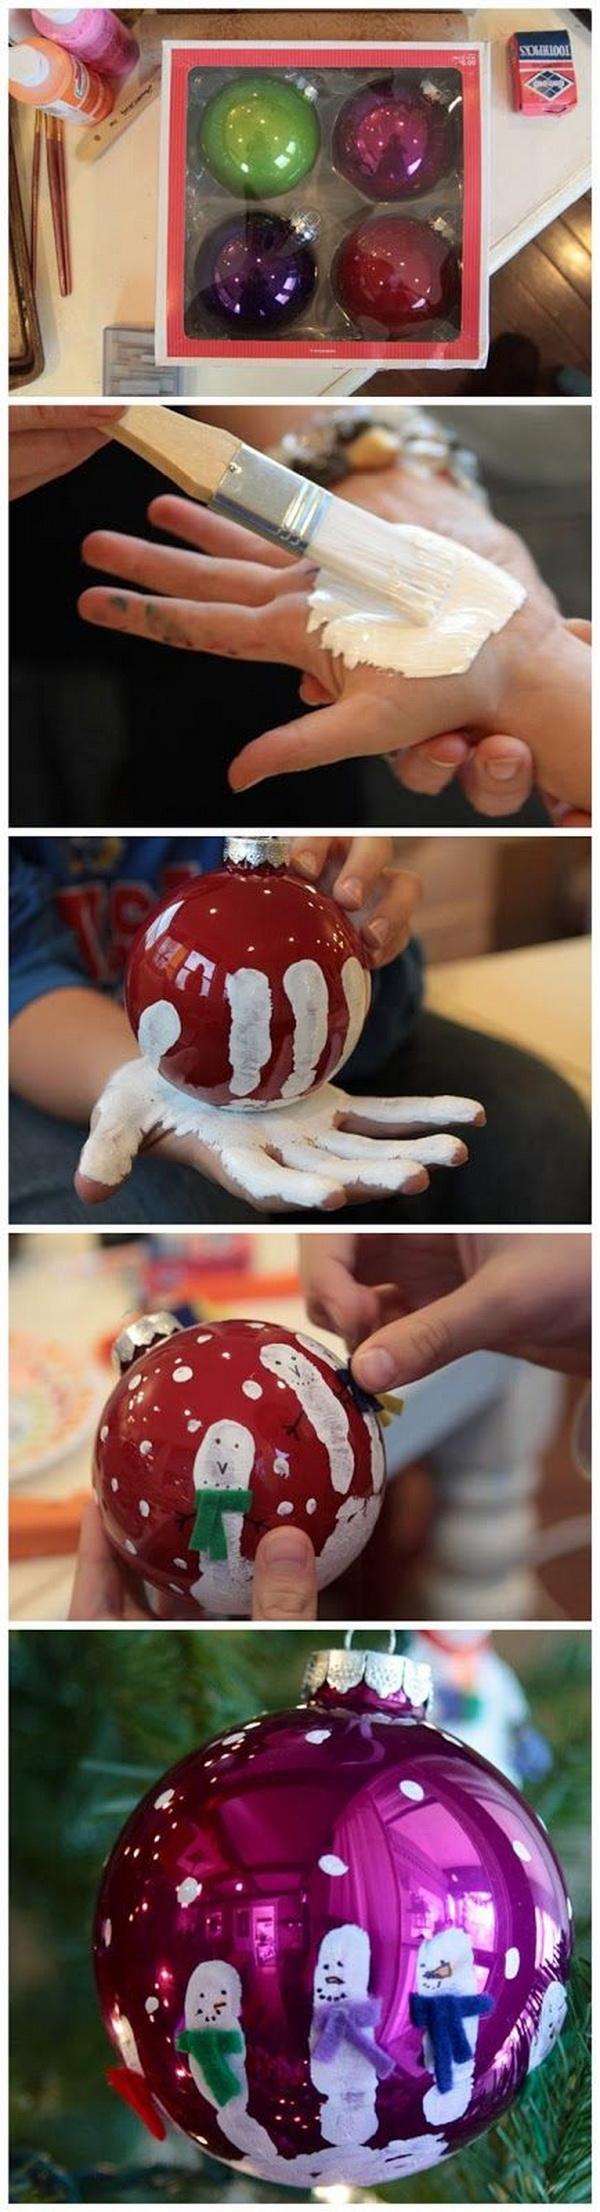 DIY Hand-Printed Ornaments